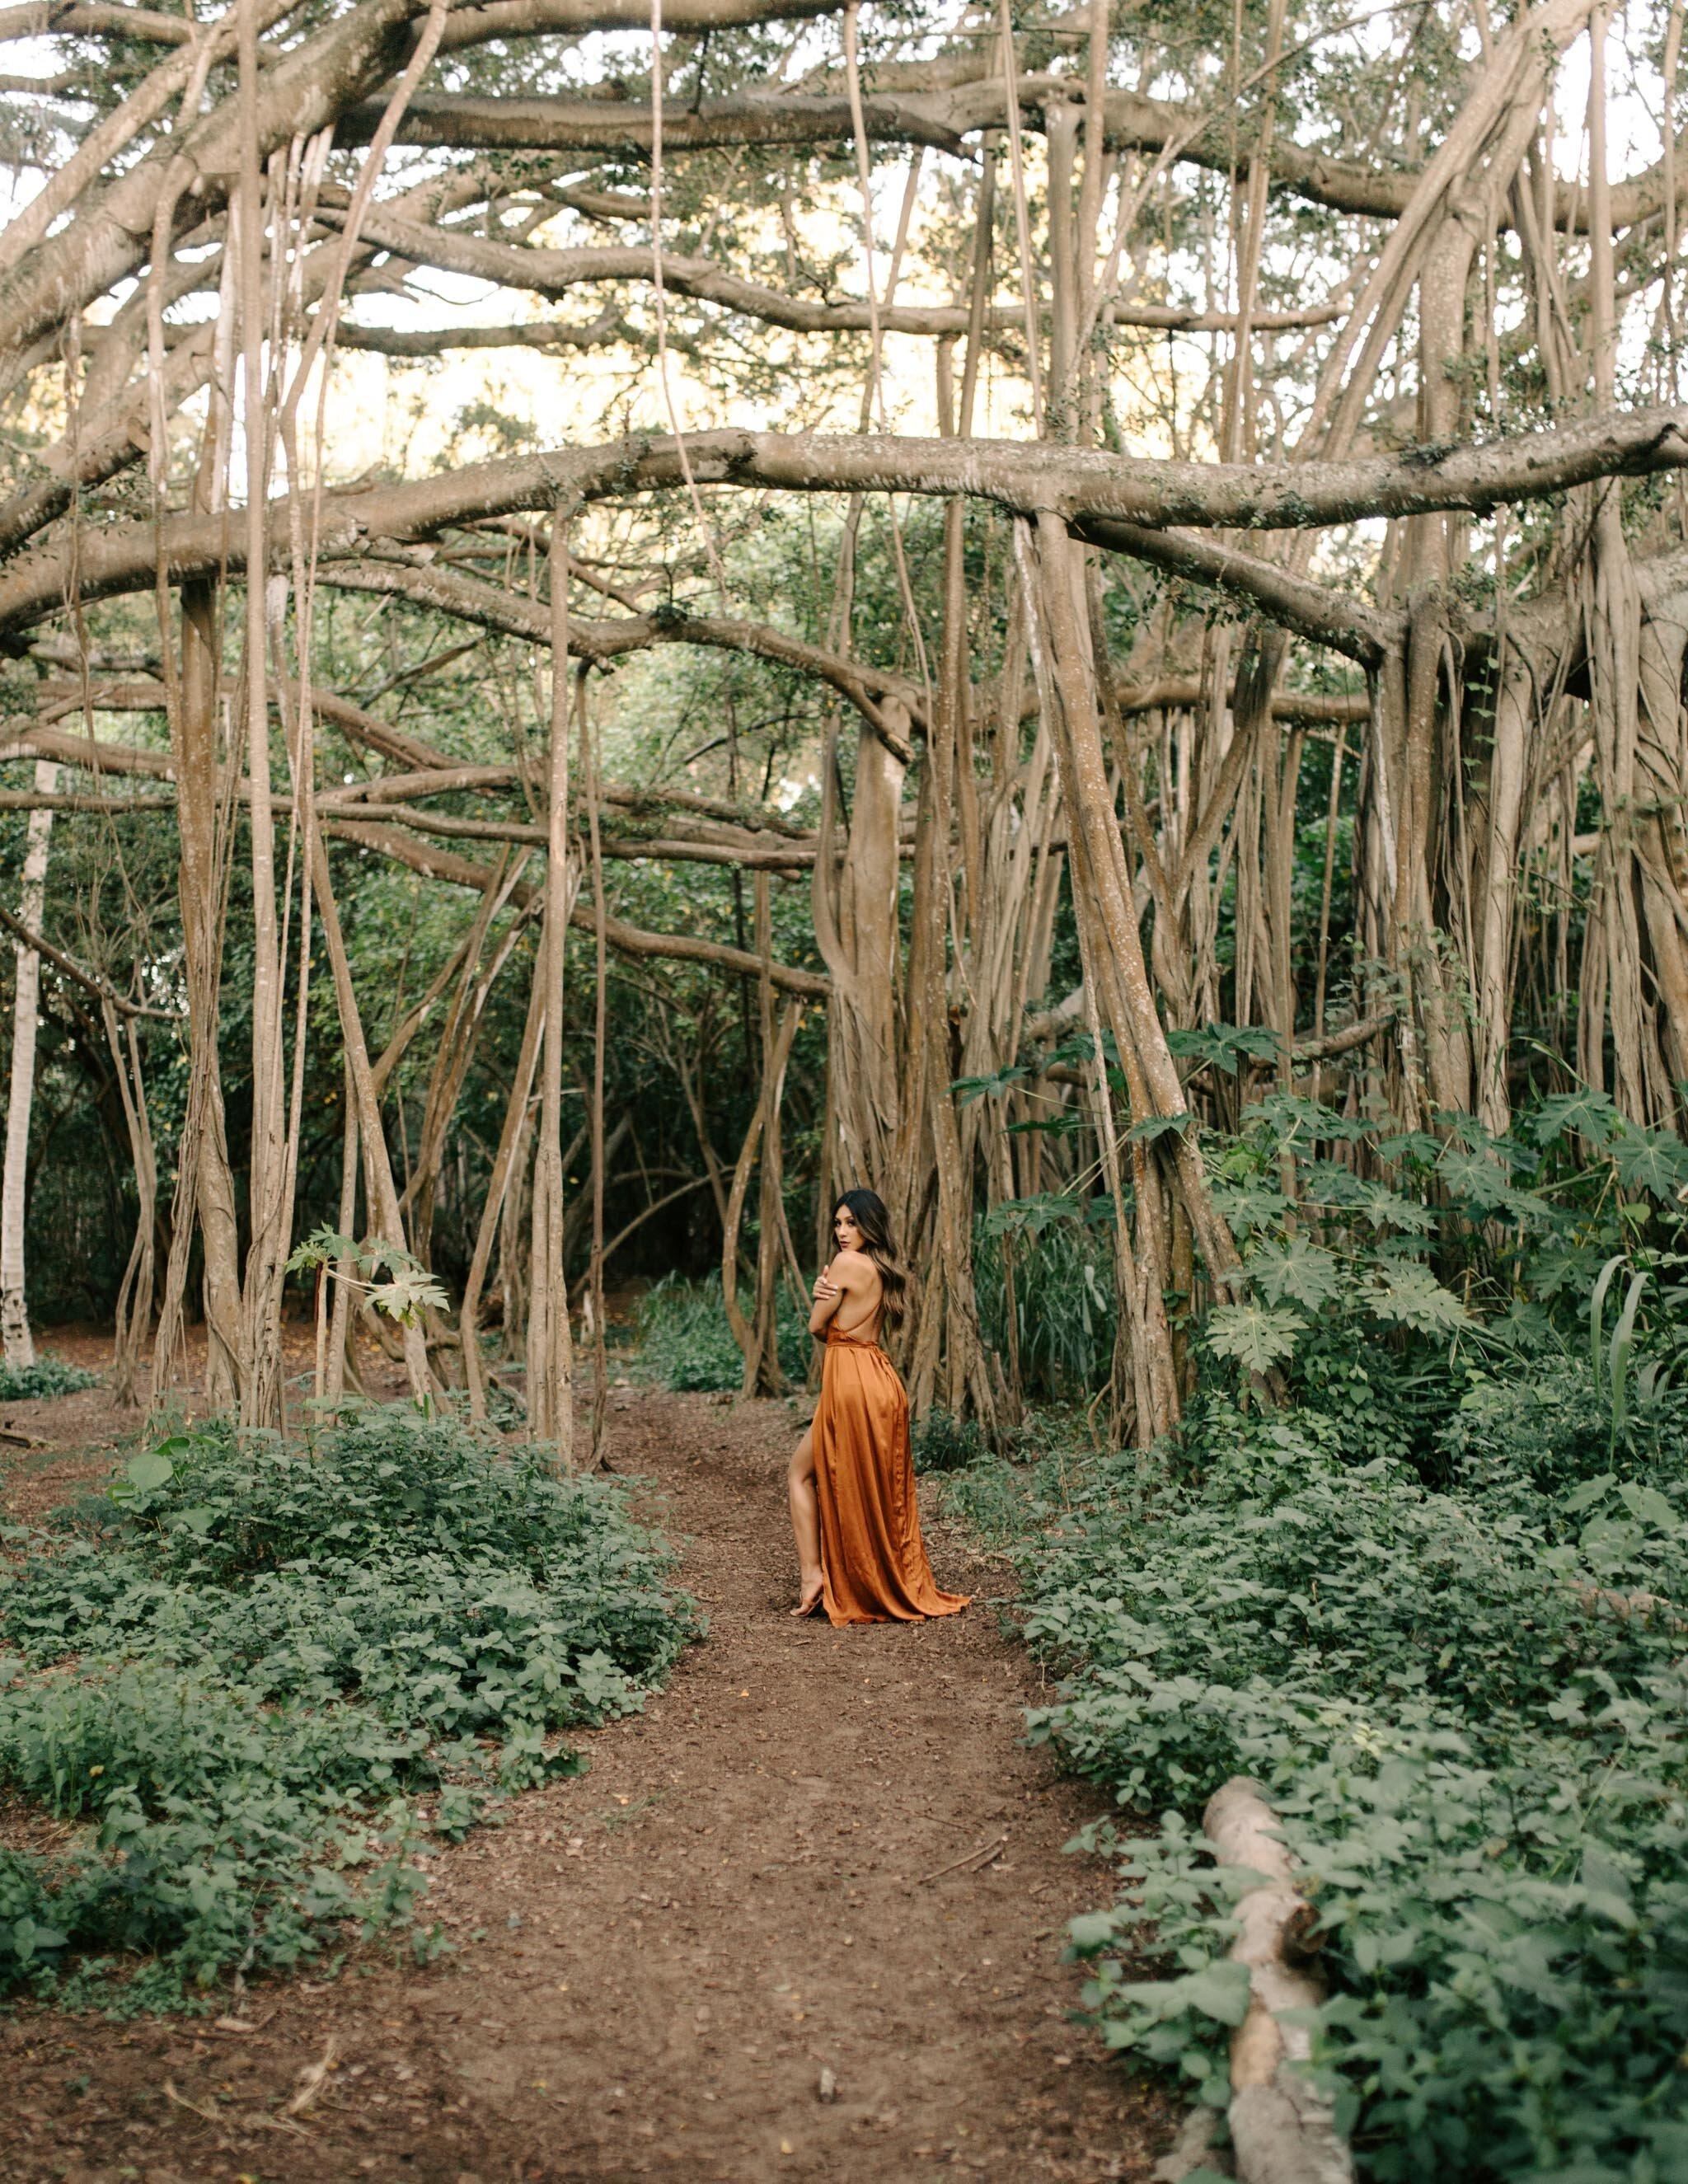 Jxnmama Birthday Photoshoot at Kawela Bay Banyan Trees By Oahu Photographer Desiree Leilani